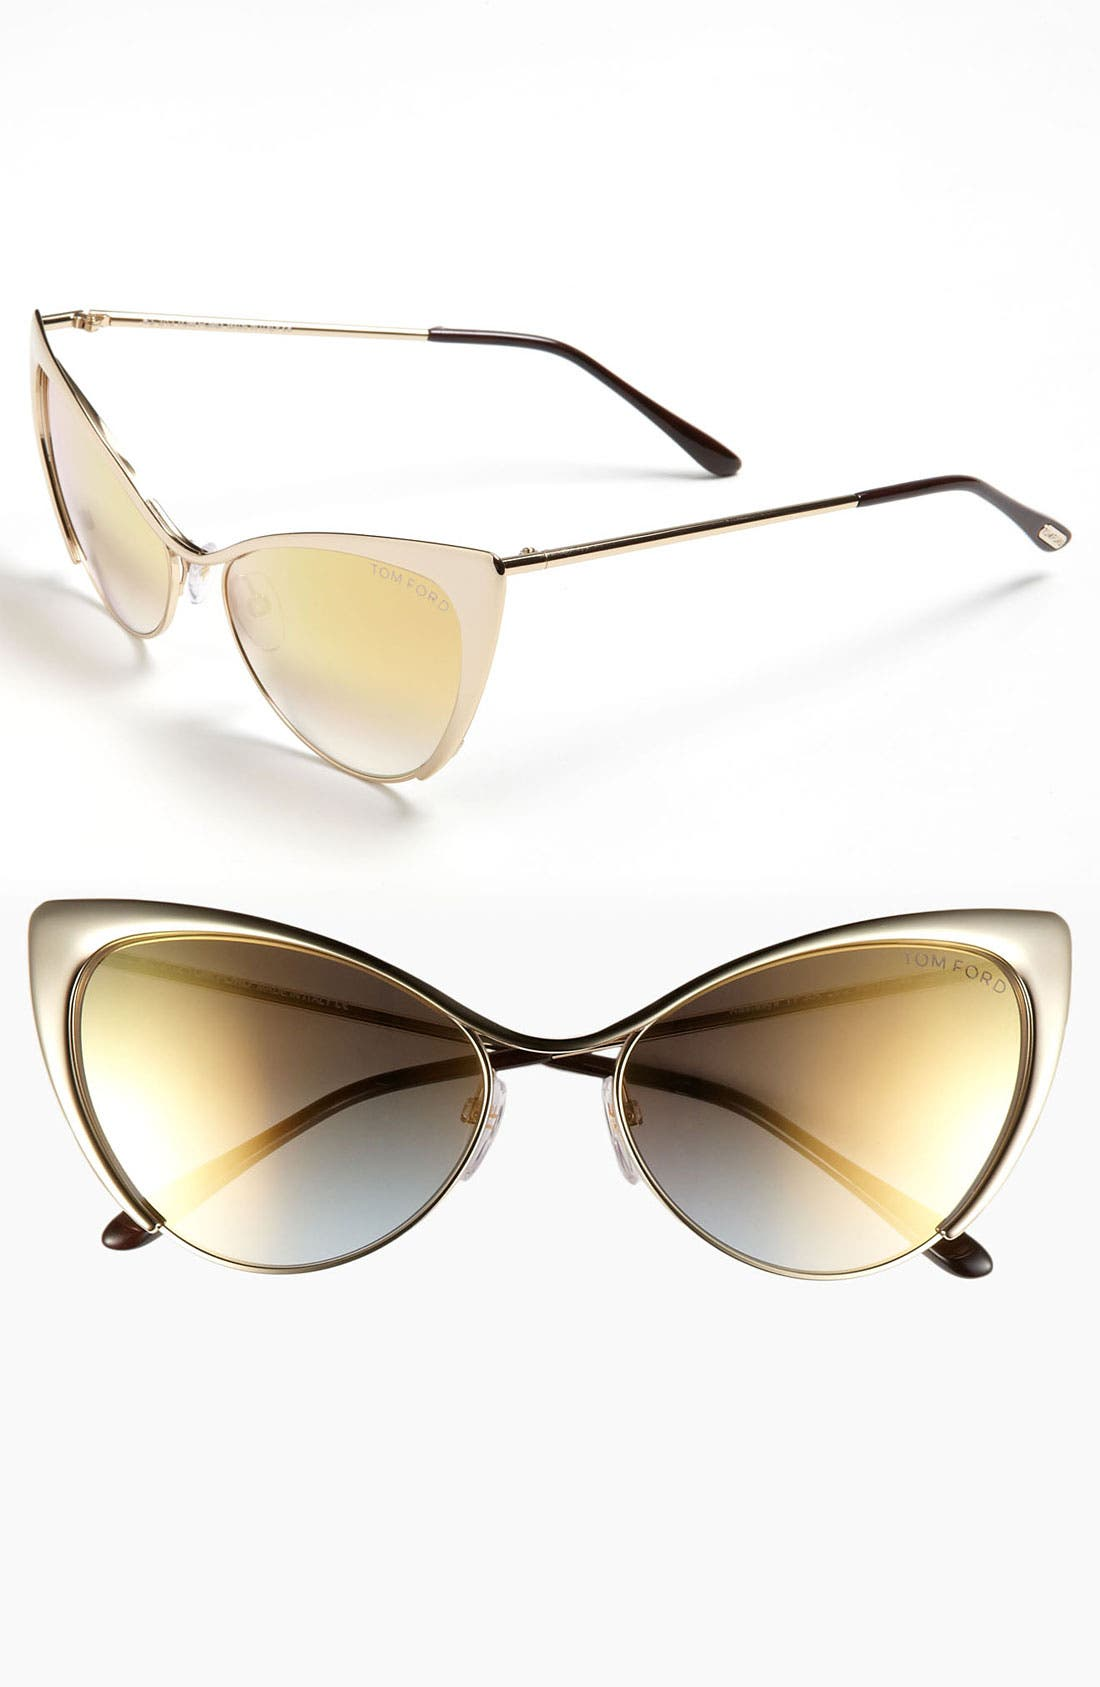 Alternate Image 1 Selected - Tom Ford 'Nastasya' 56mm Sunglasses